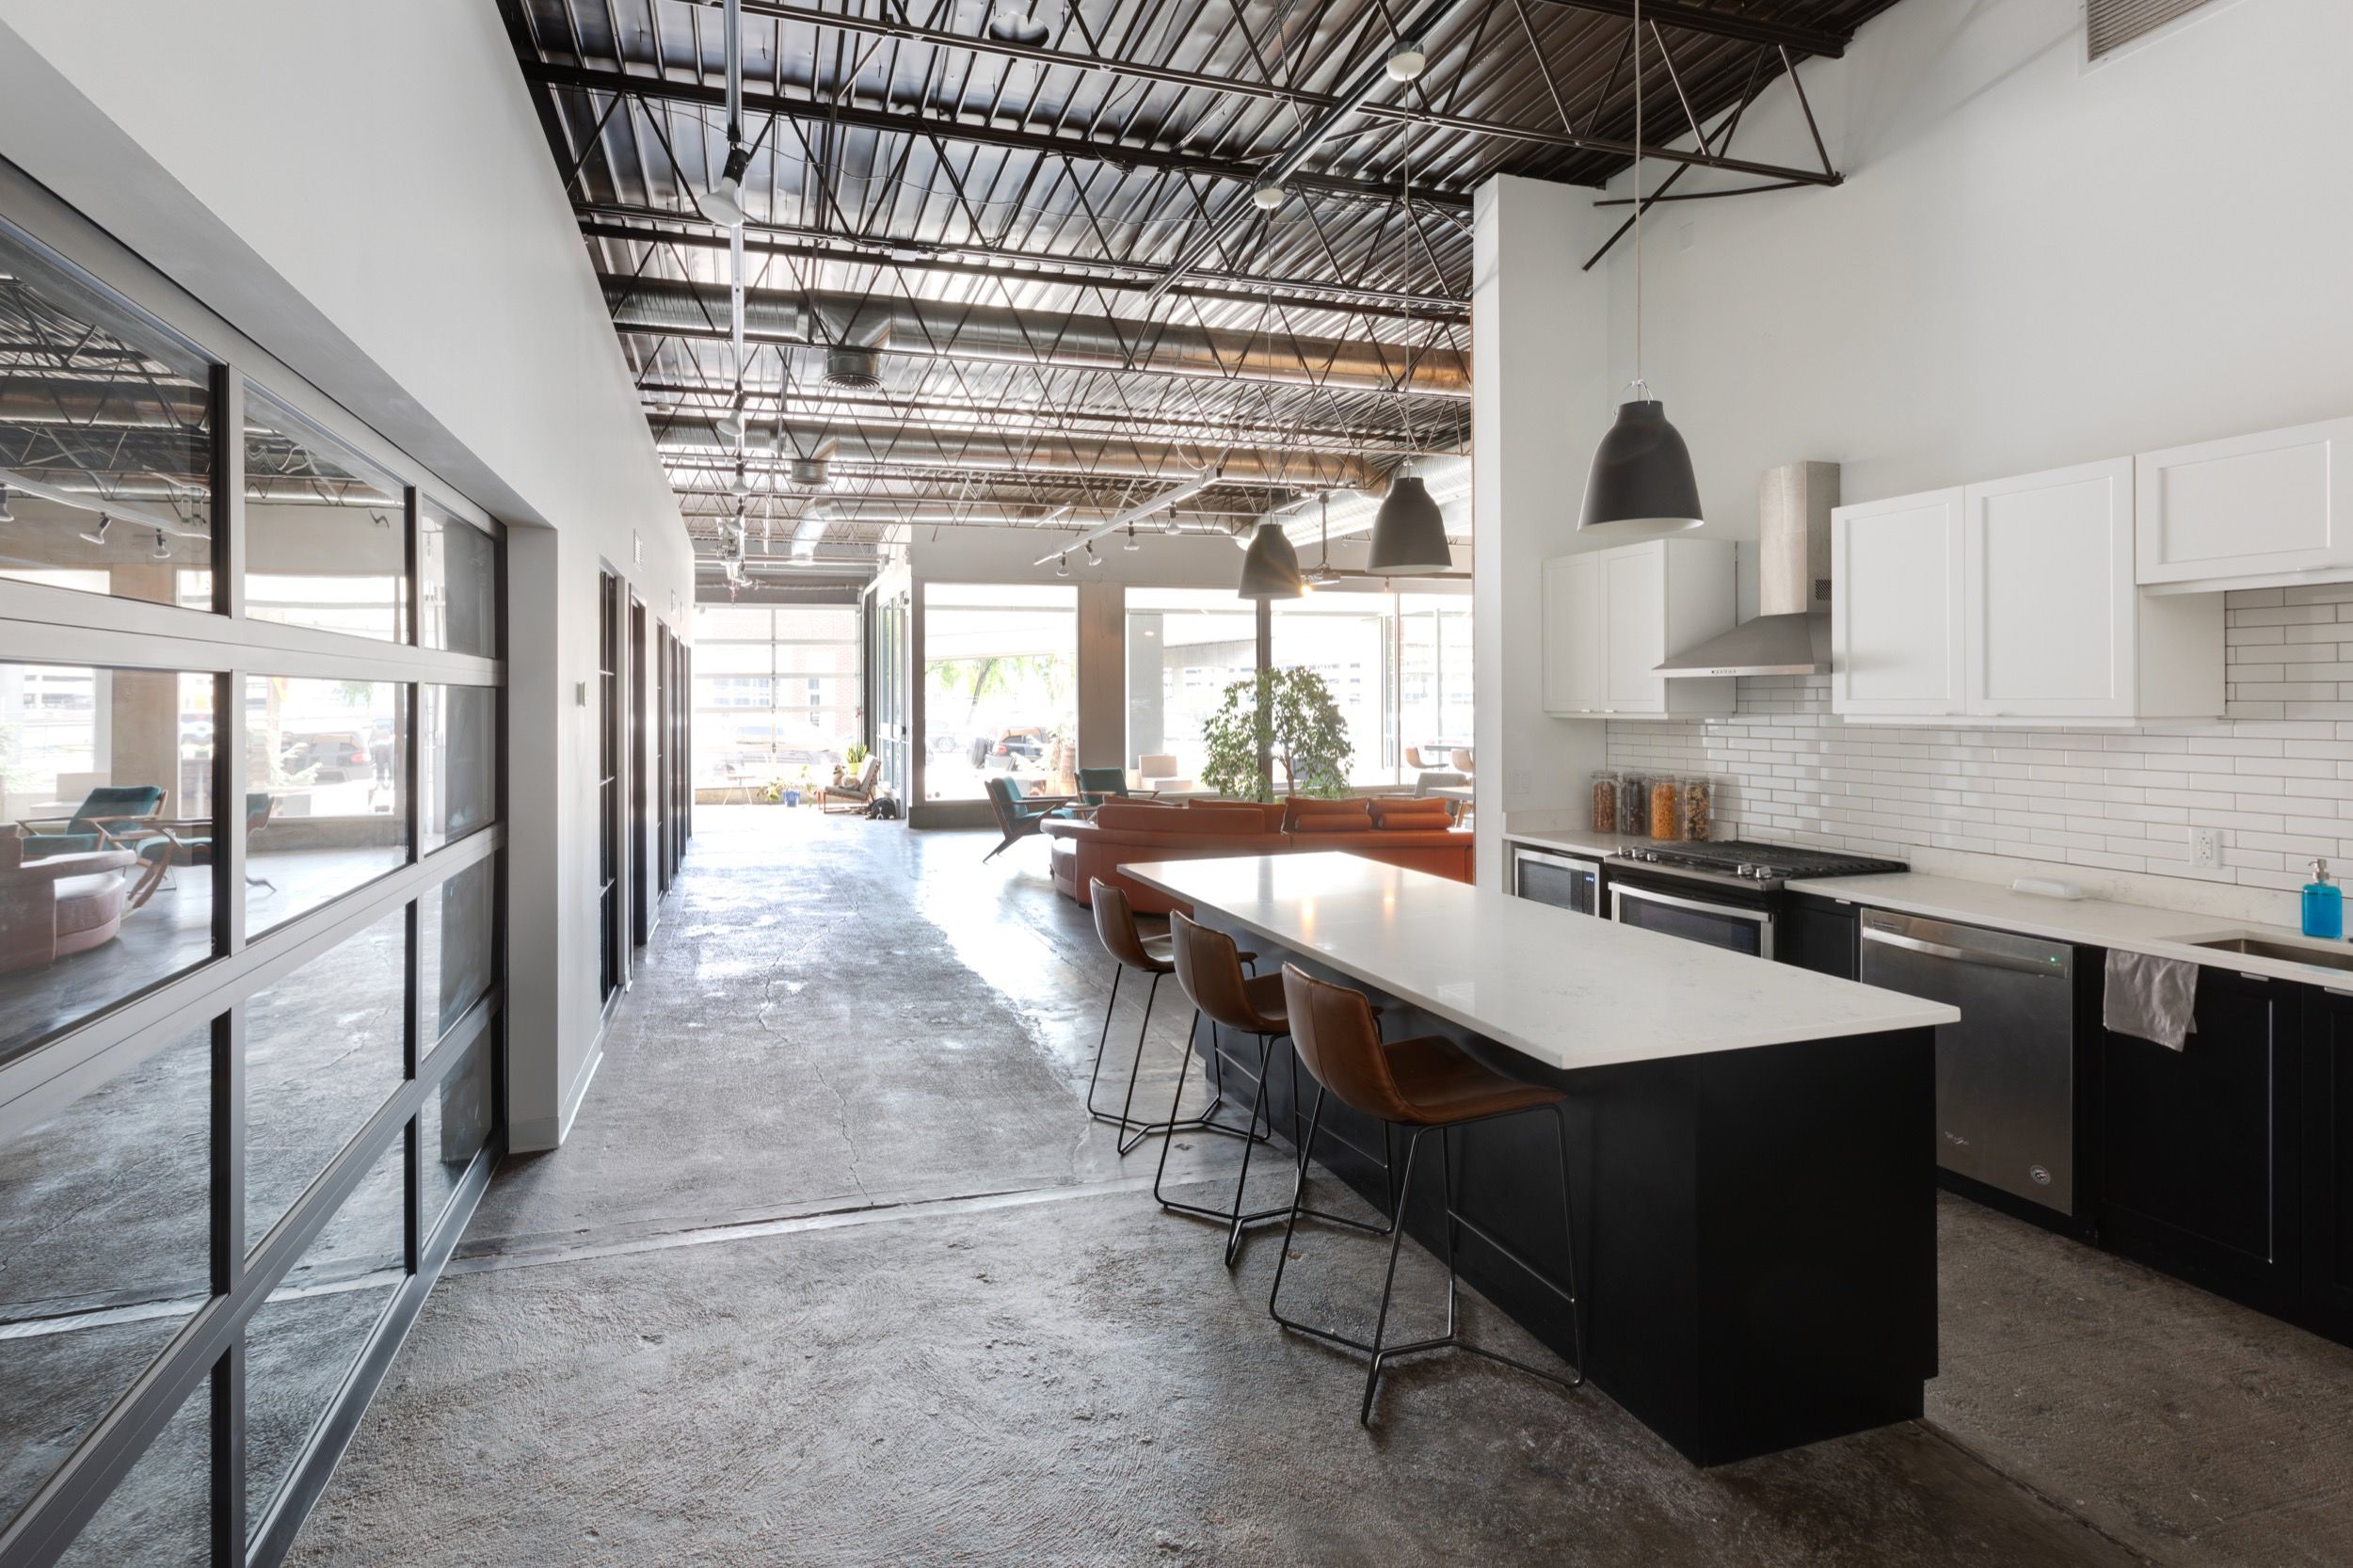 Kitchen space at BicMedia